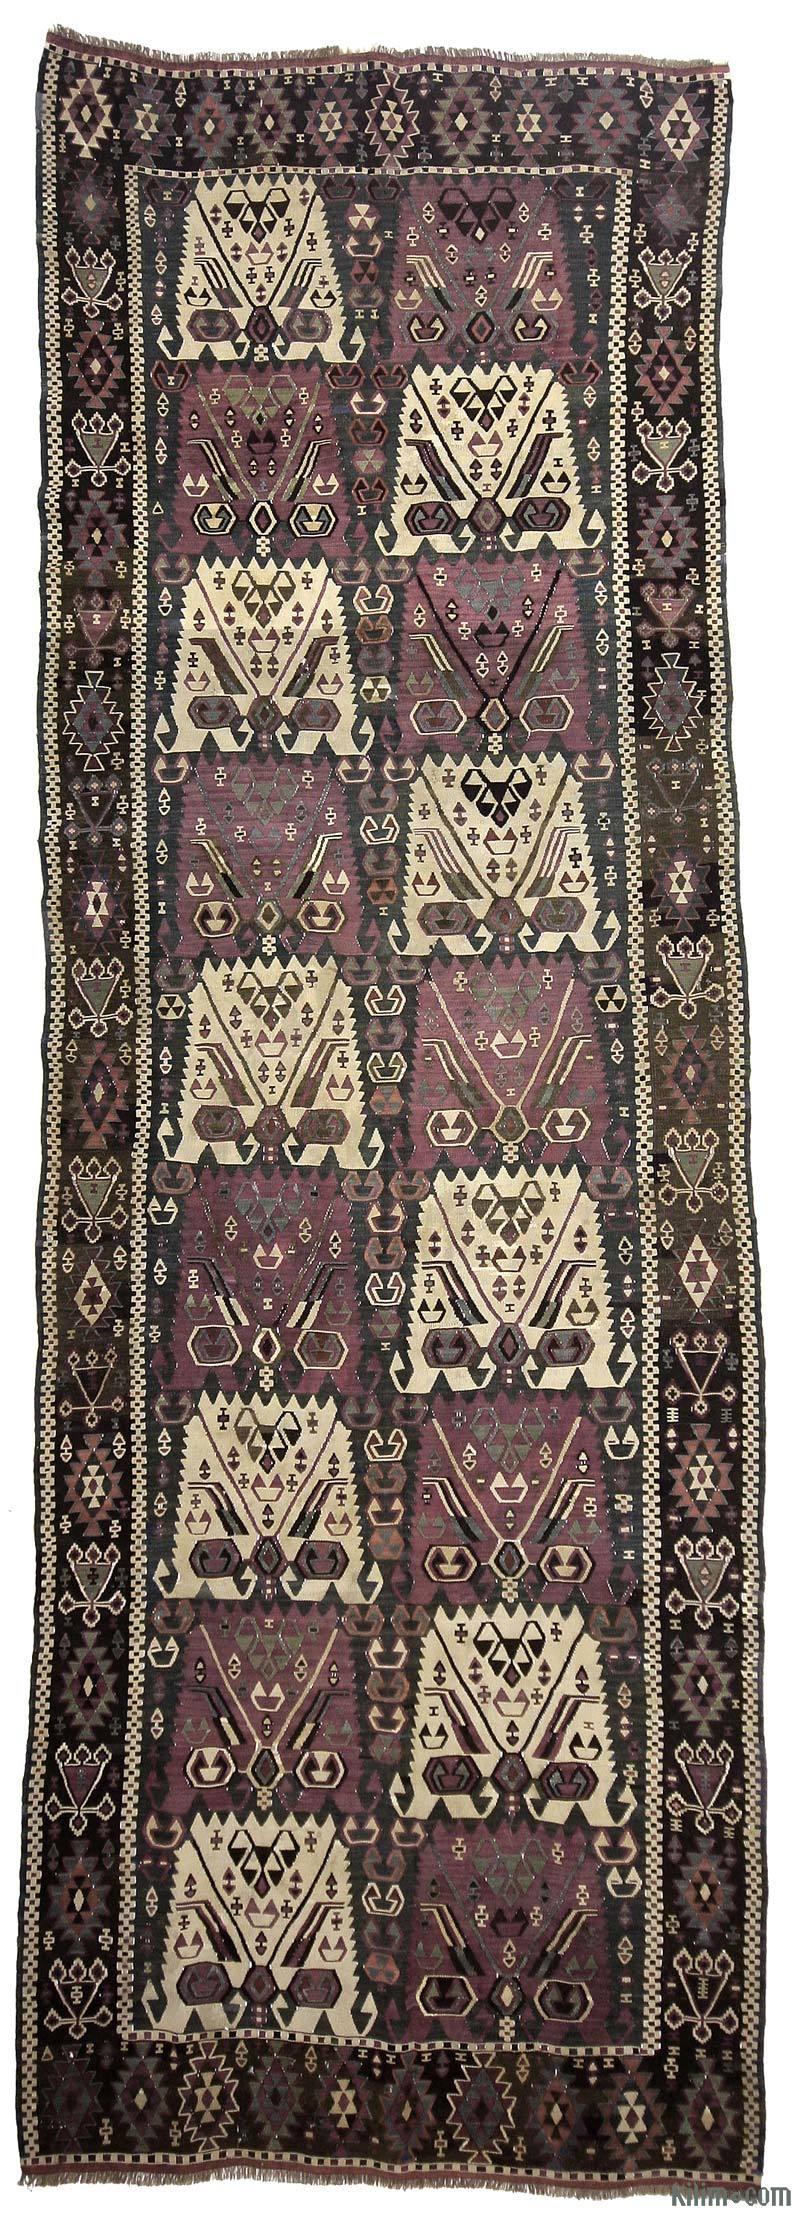 K0020927 Purple Antique Kagizman Kilim Rug